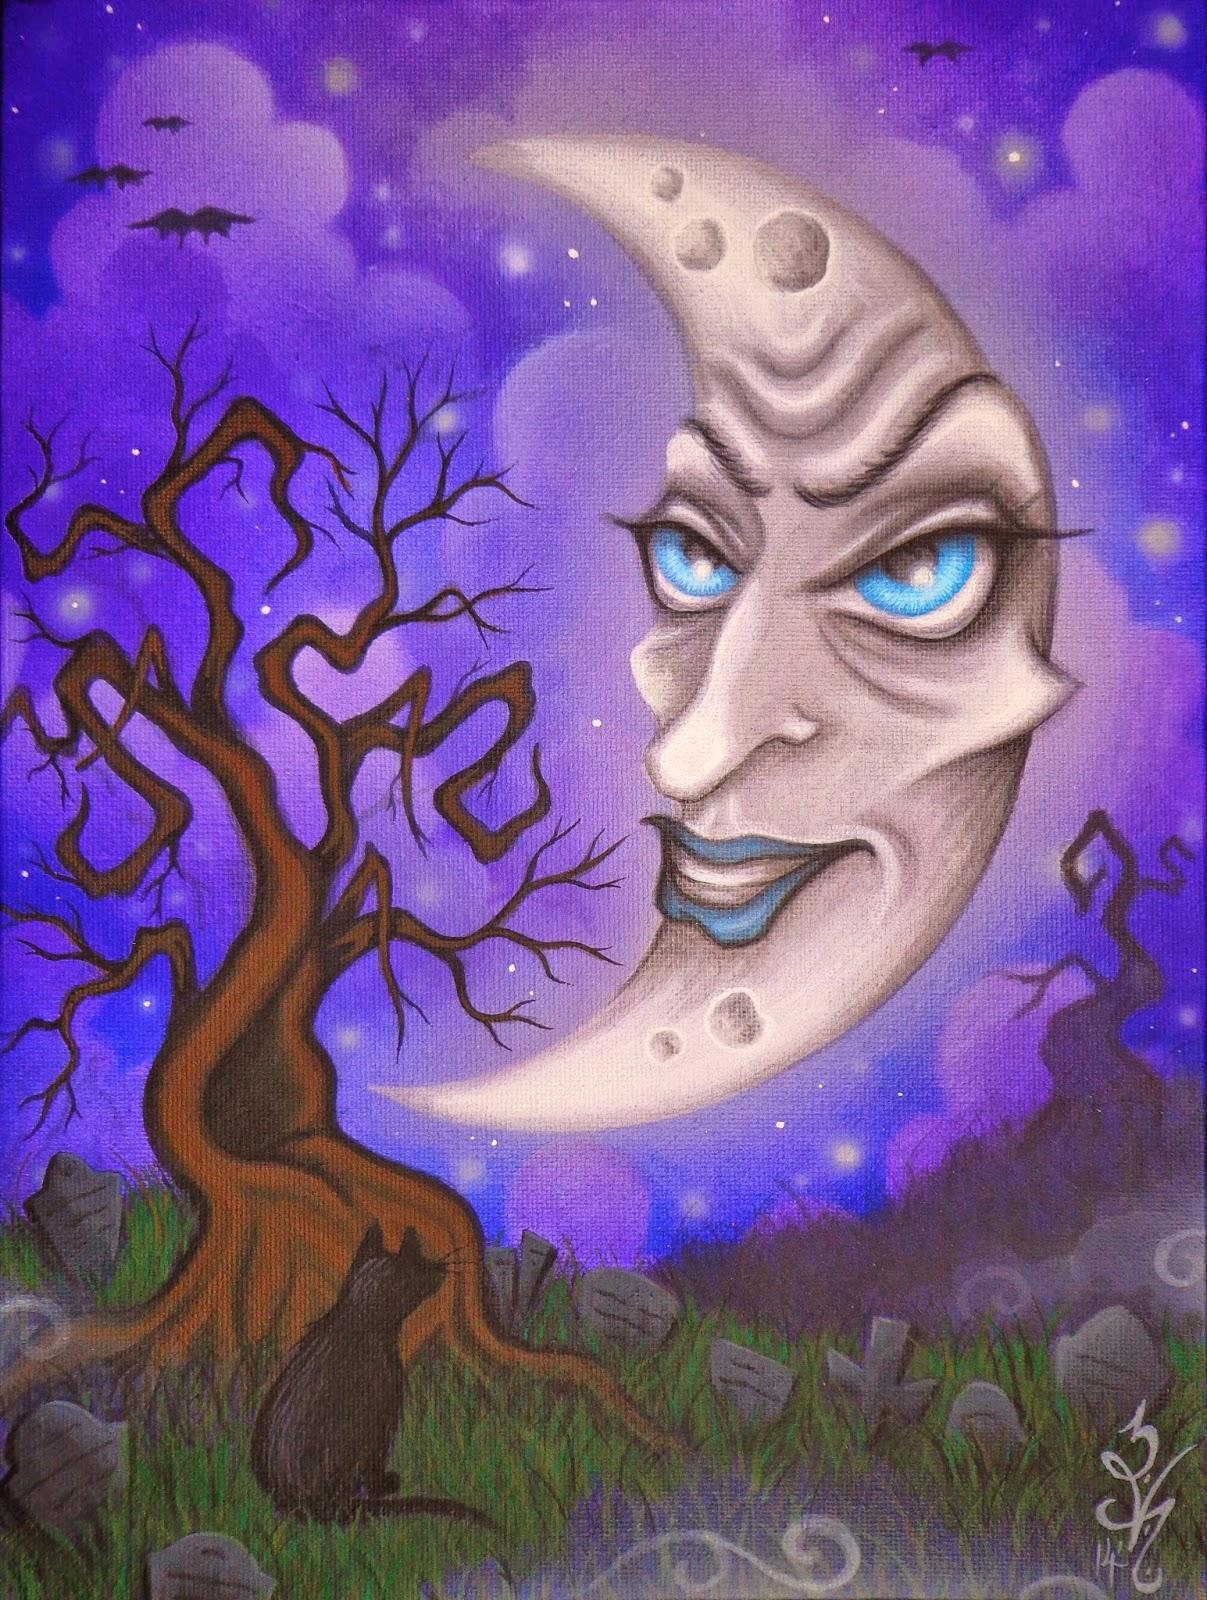 https://www.etsy.com/listing/202367177/original-fantasy-lowbrow-big-eye-face?ref=shop_home_active_5